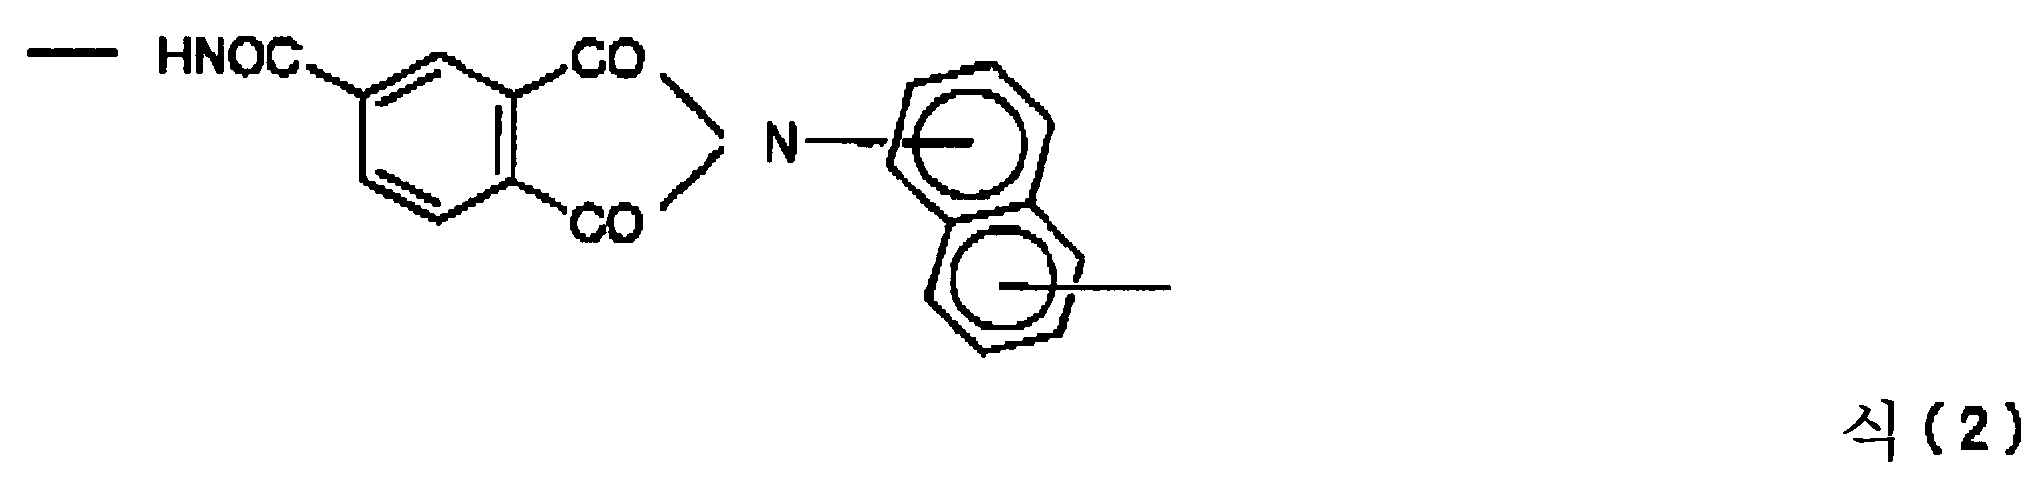 Figure 112001018942212-pat00006